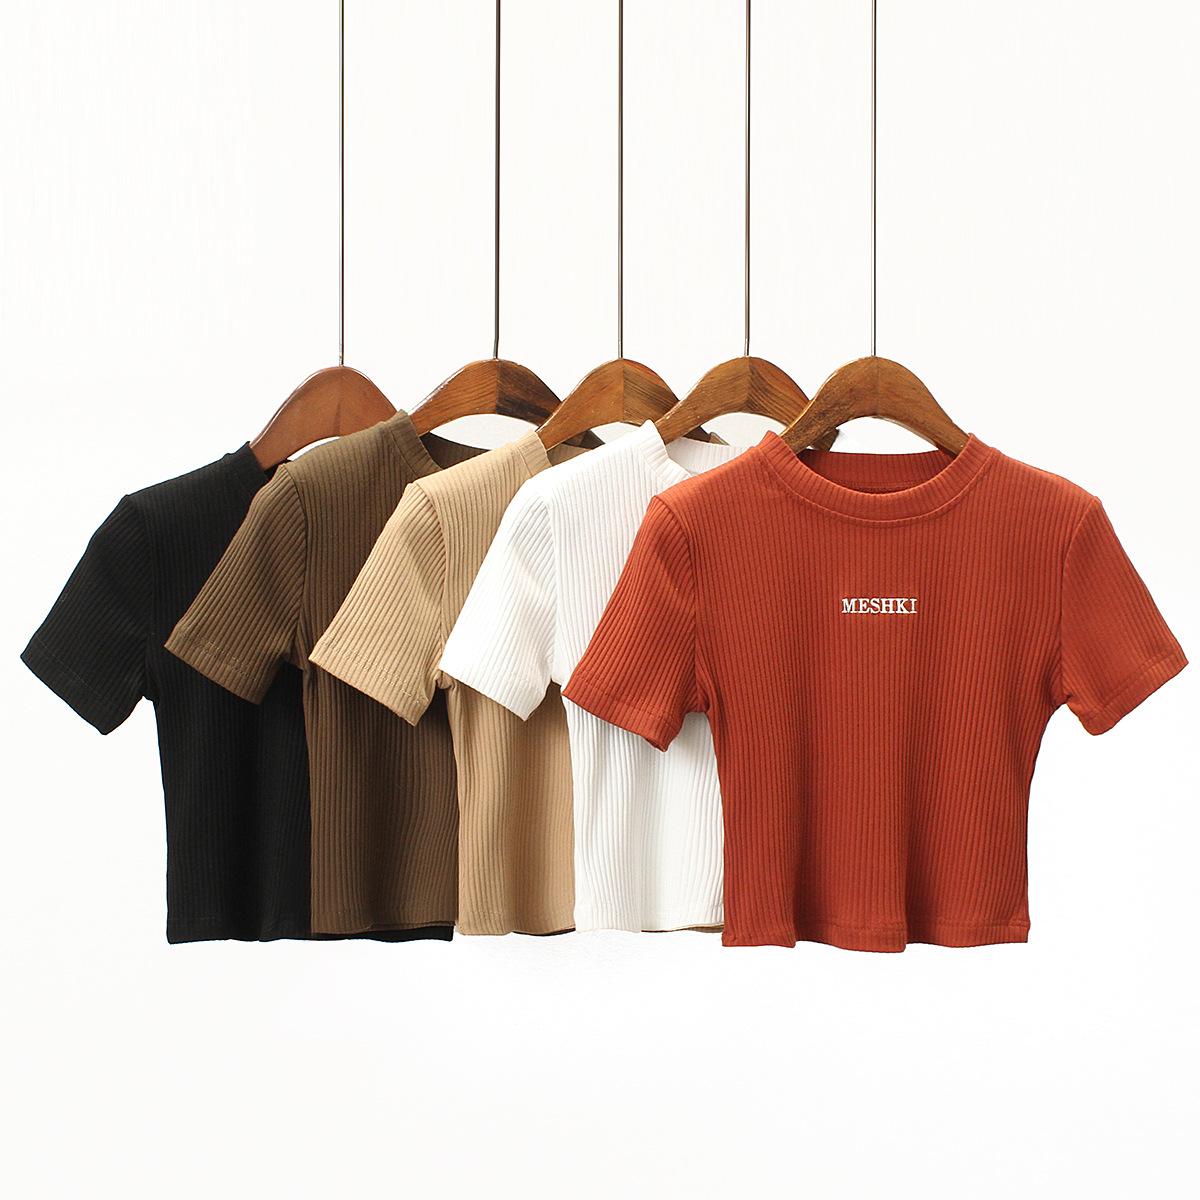 ShirtTTopCropBasicSoildSleeveShortCasualWomens2019